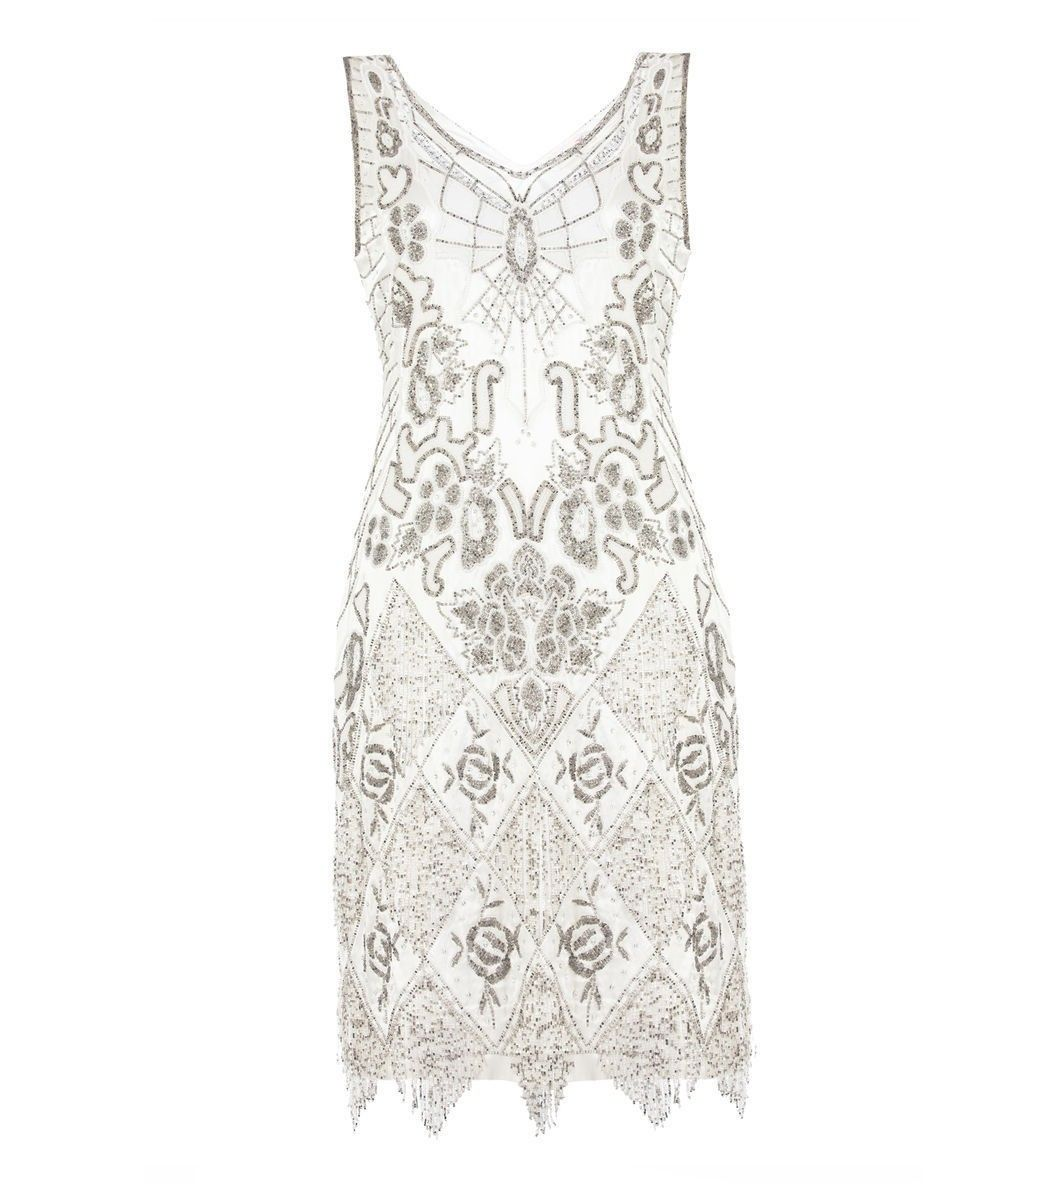 Alannah hill black and white dress